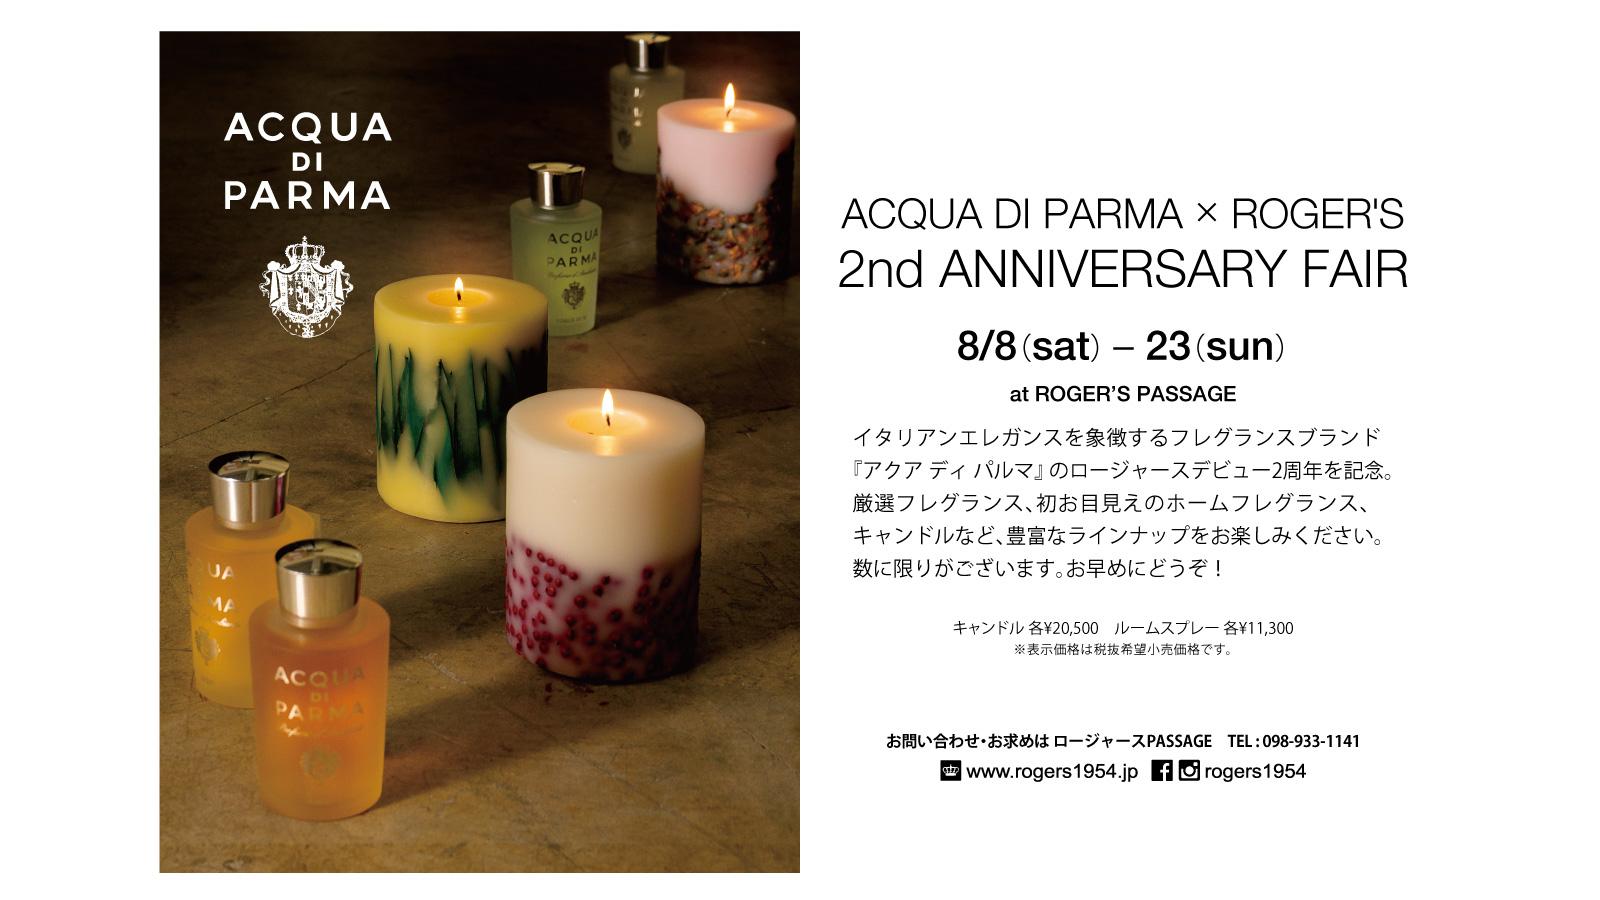 ACQUA DI PARMA X ROGER'S ACQUA DI PARMA ロージャースデビュー2周年アニバーサリーフェア